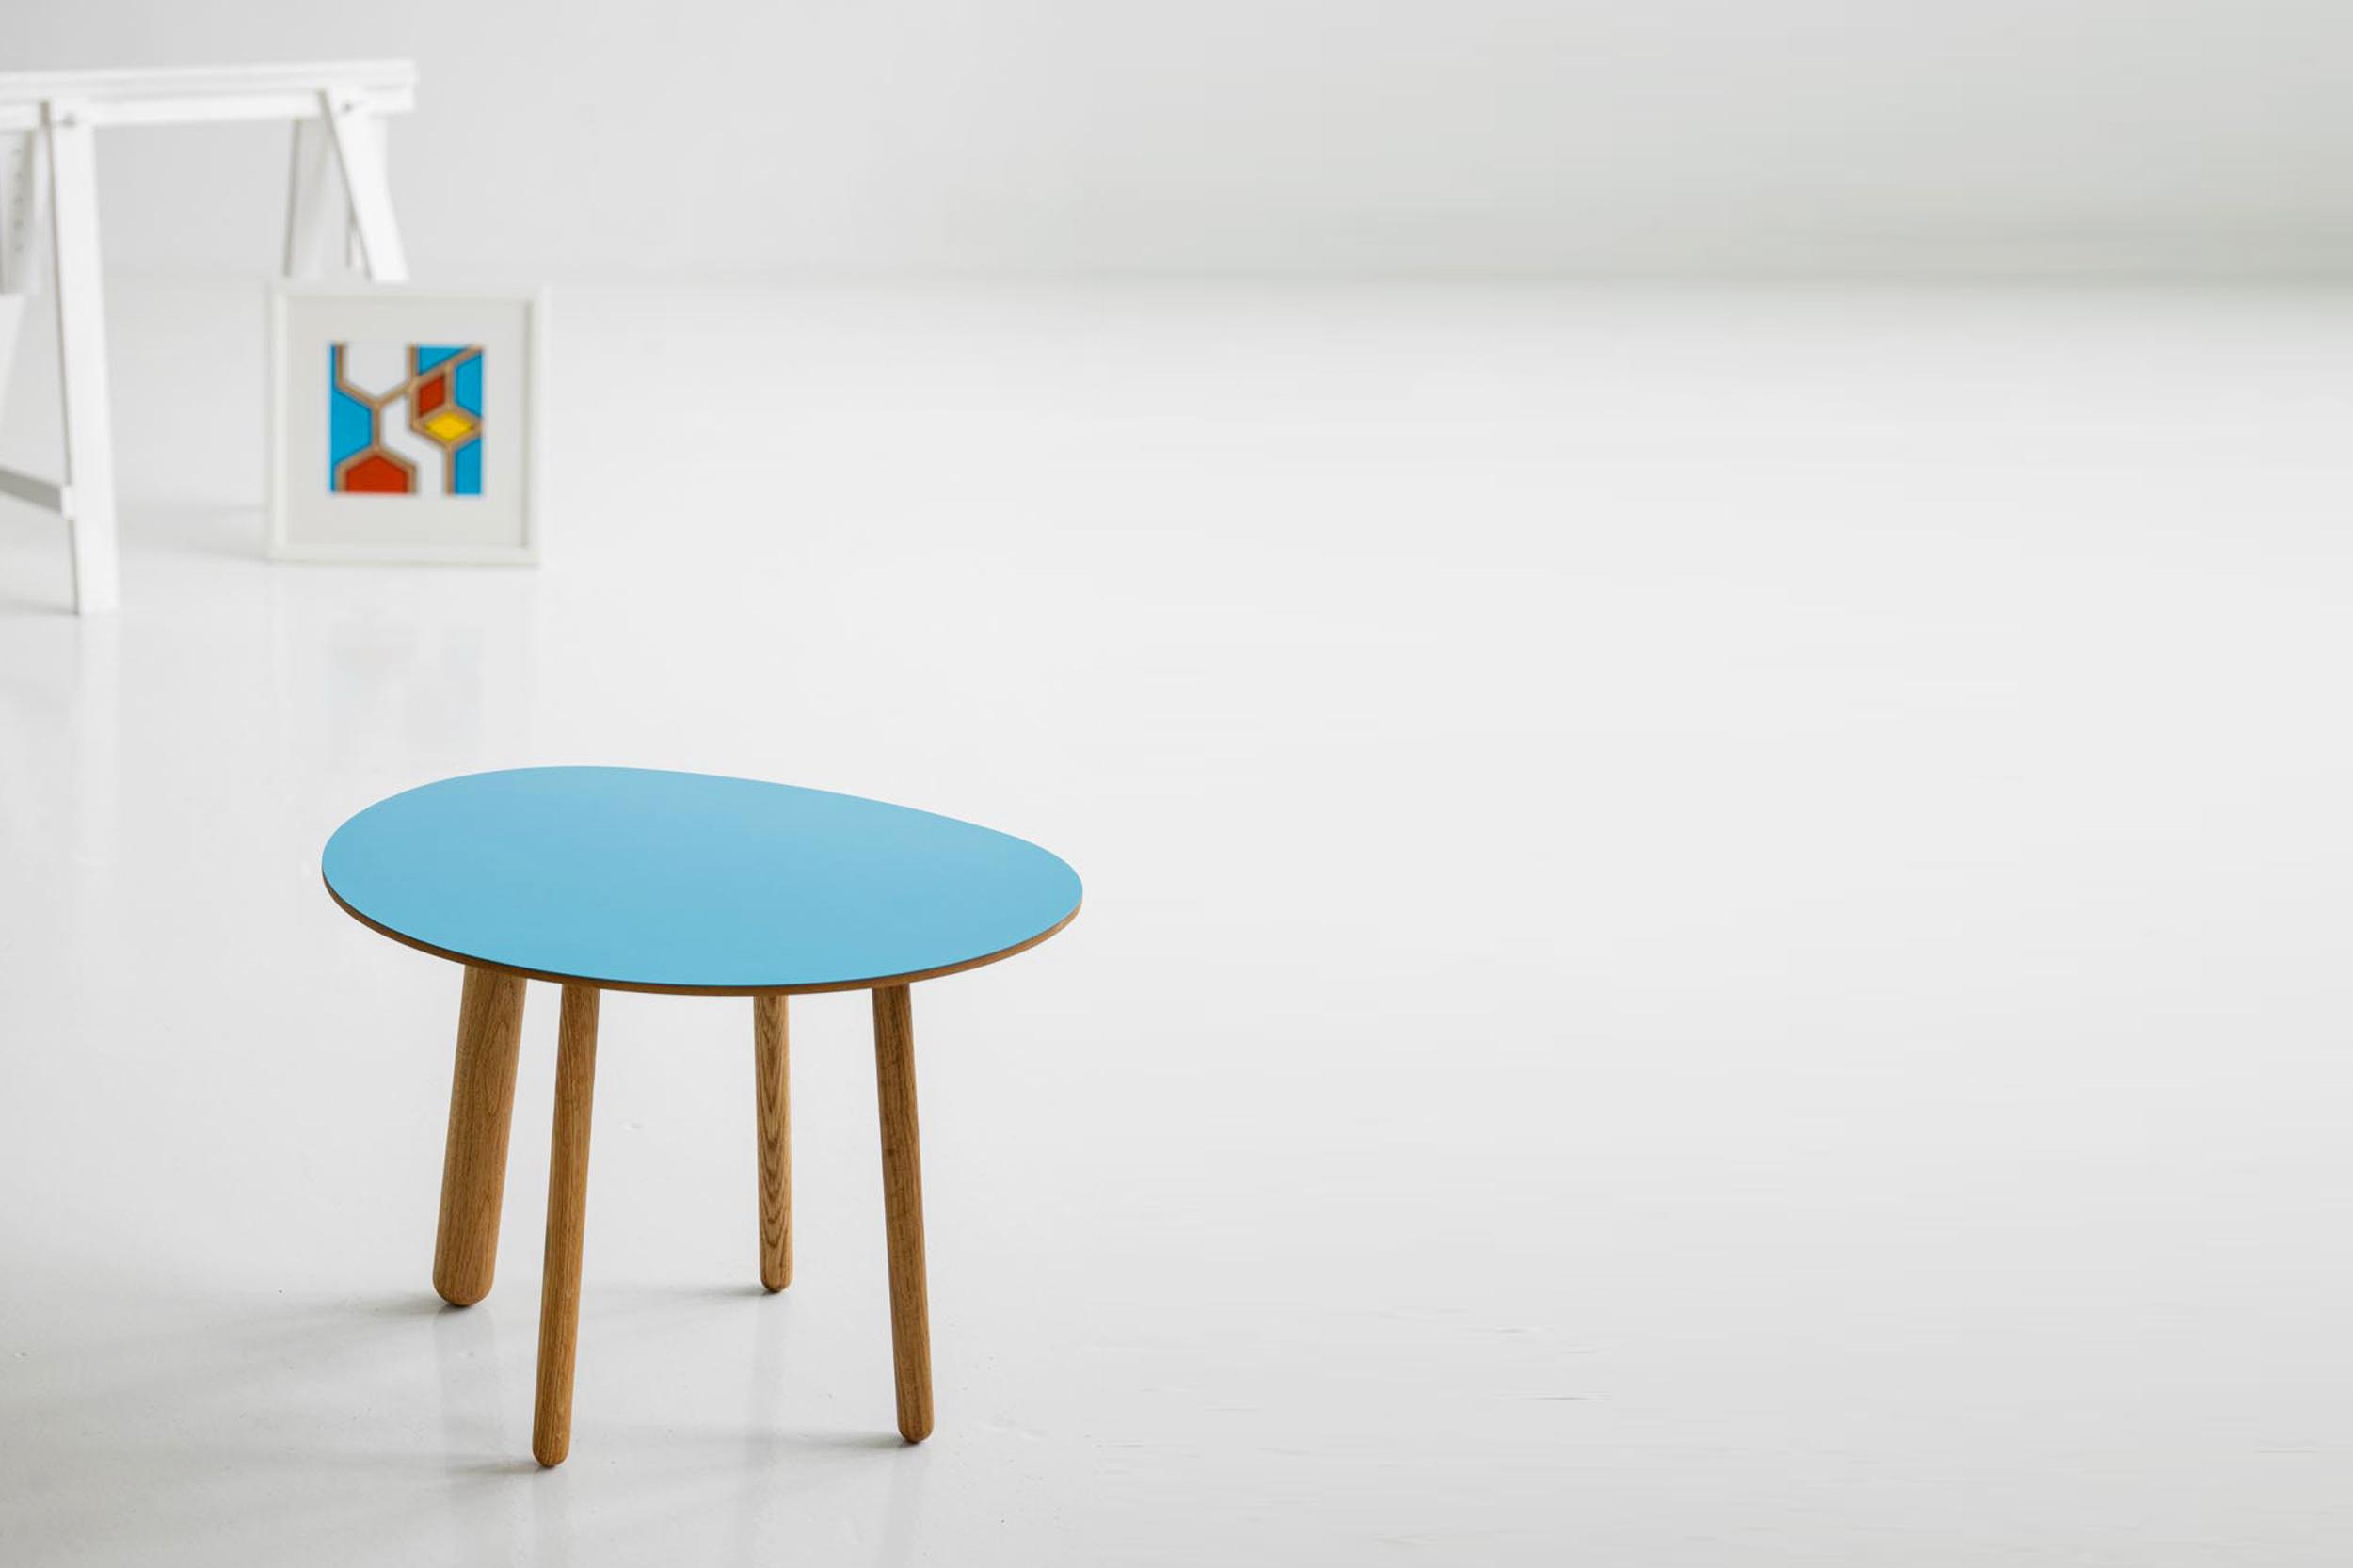 Morris coffee table model 5 in california blue